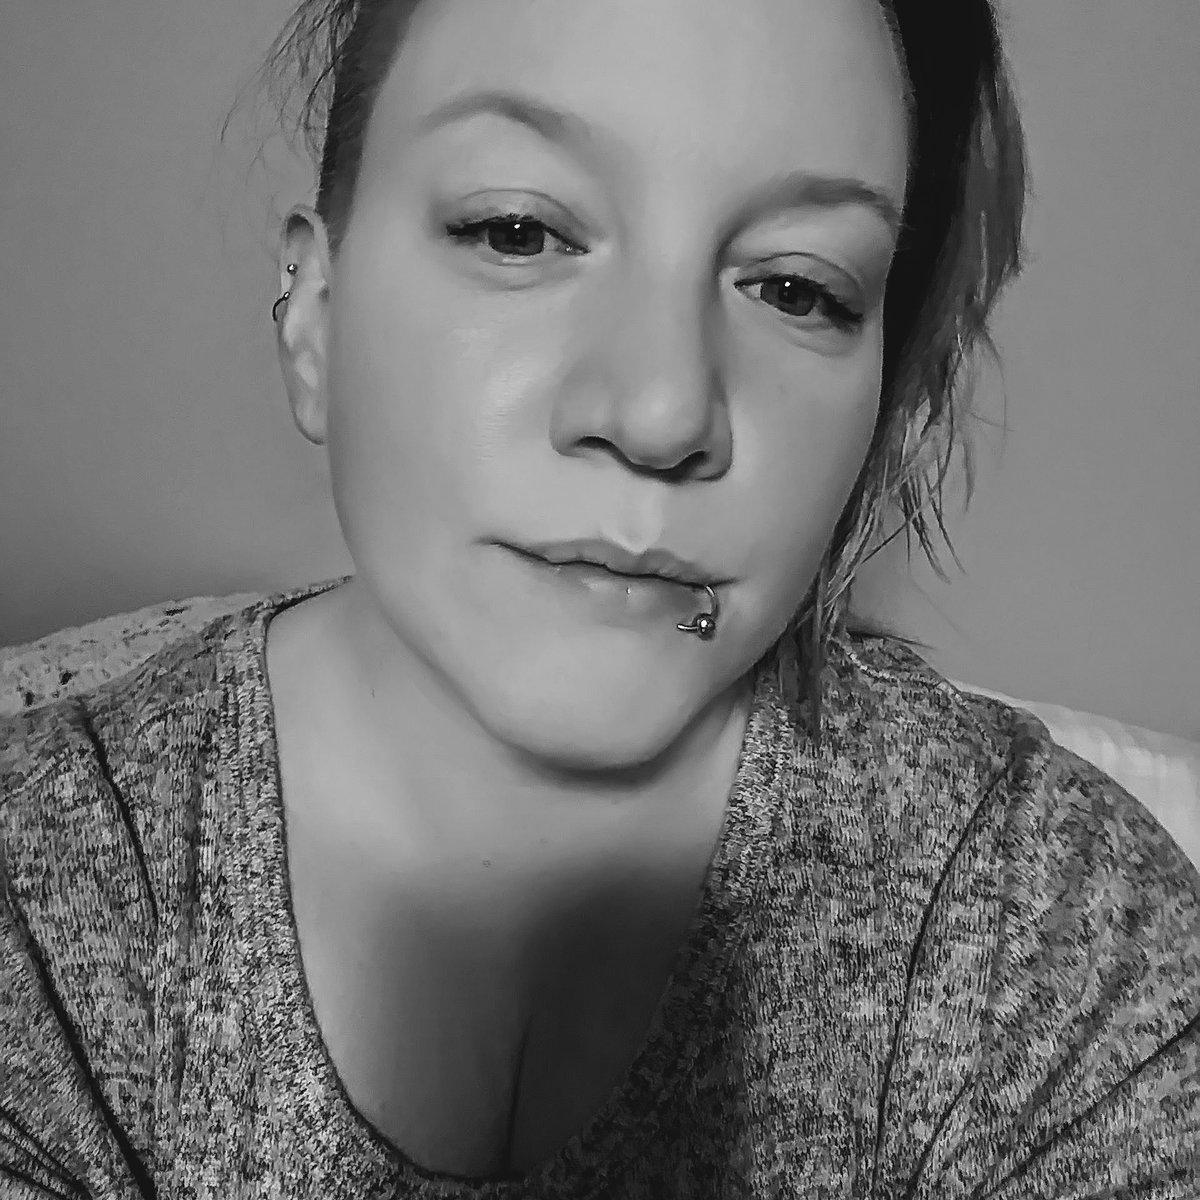 I'm in a mood....can you guess? #mood #grey pic.twitter.com/x3c83tKGFK